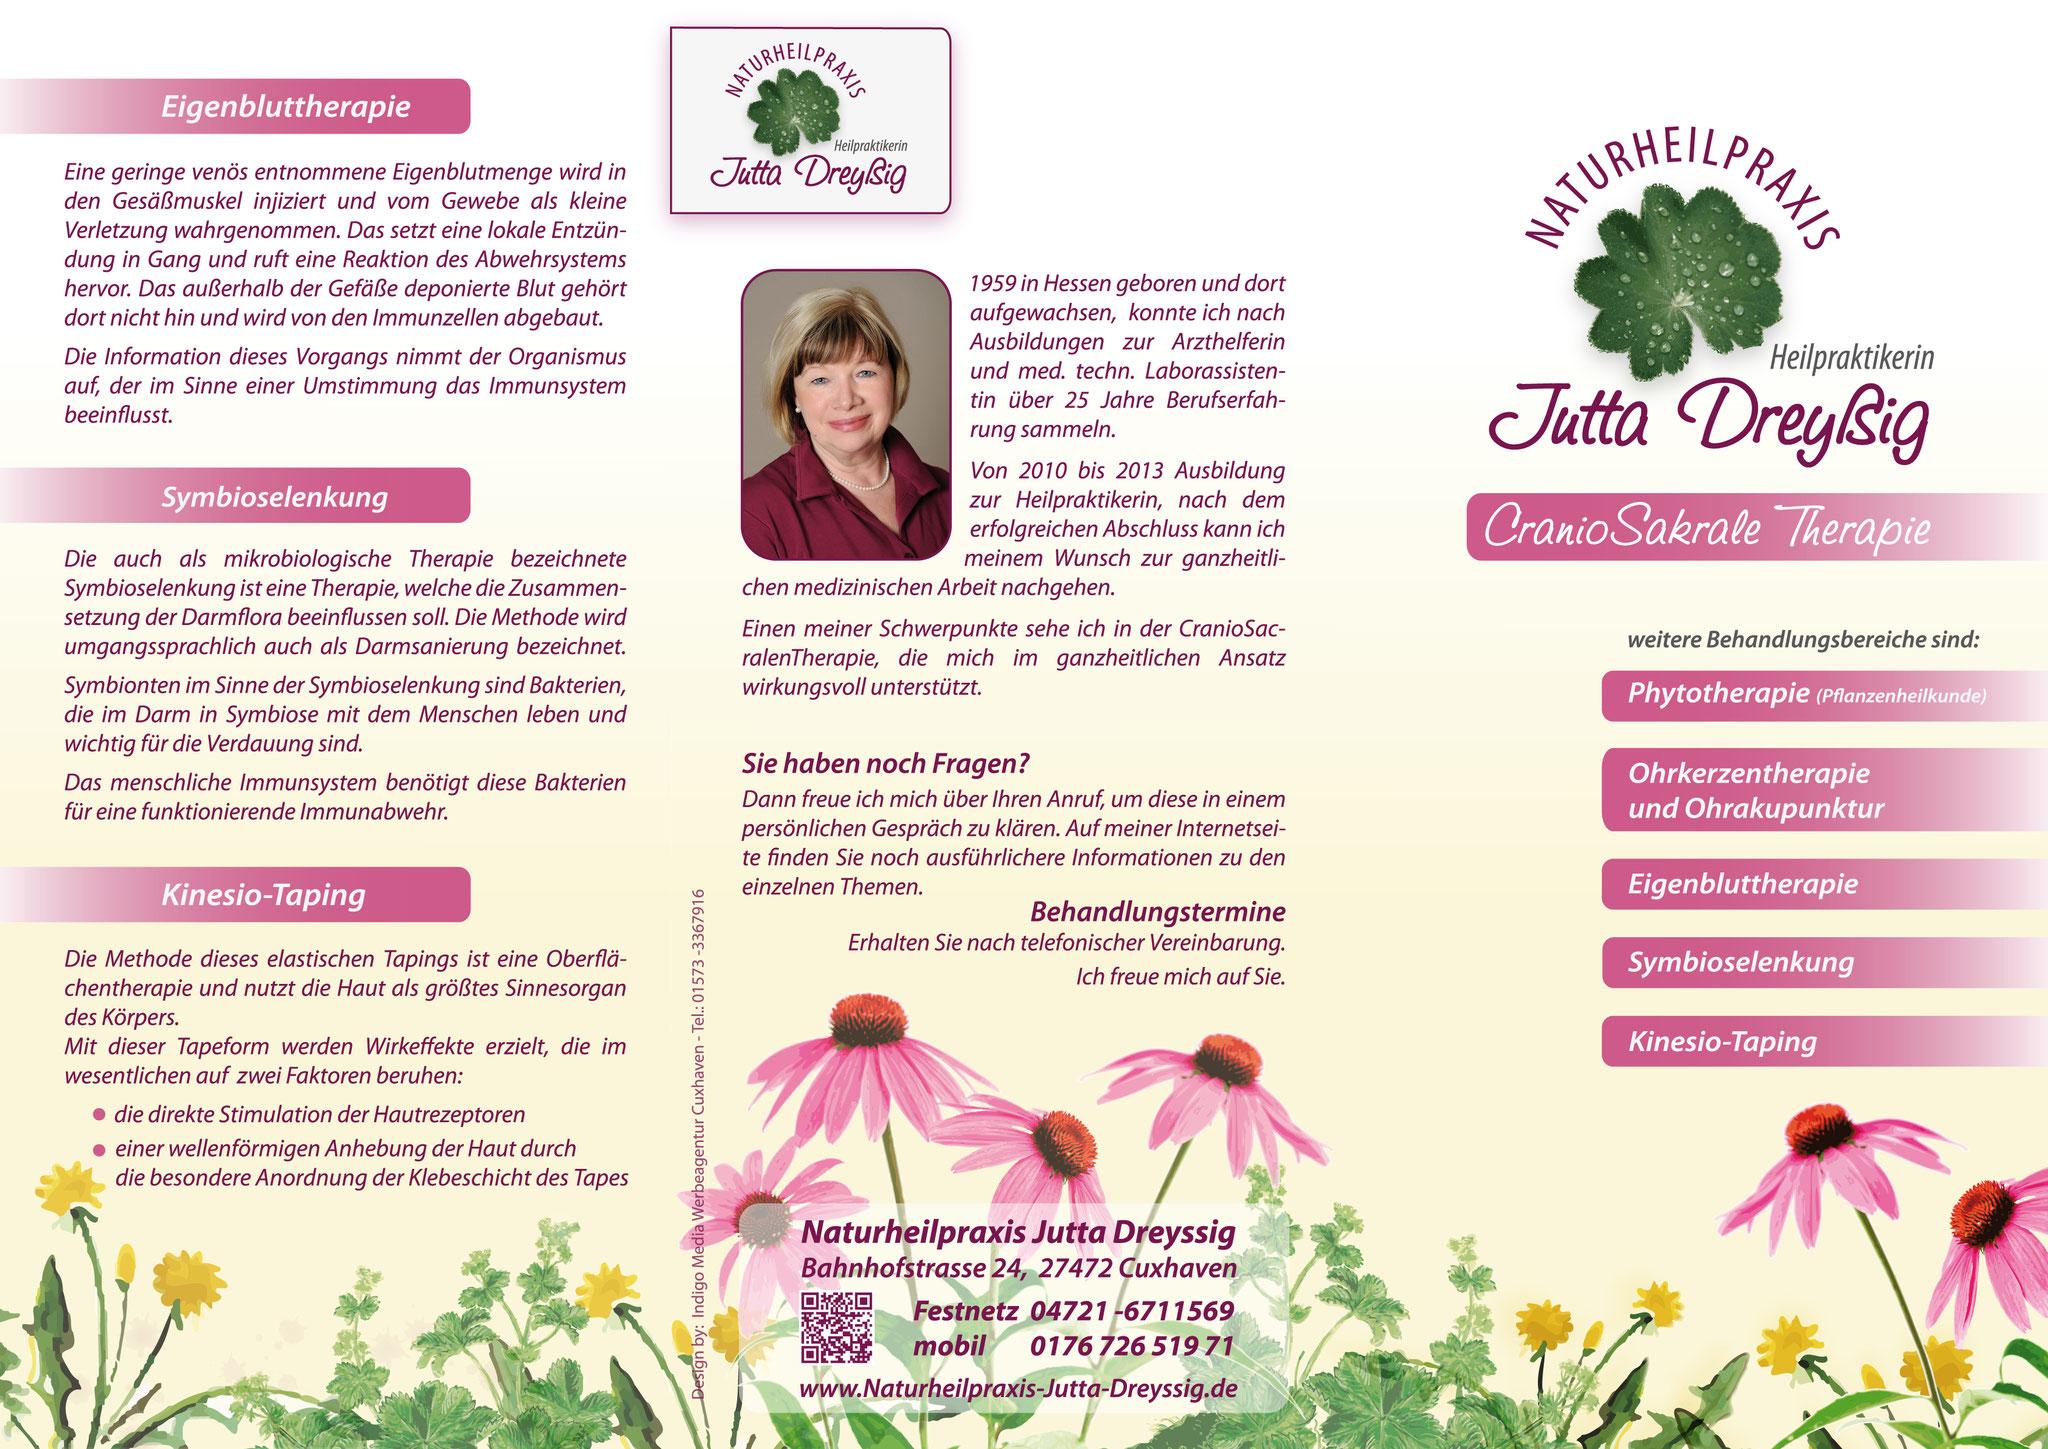 Image Folder Jutta Dreißig Heilpraktikerin, Cuxhaven Germany